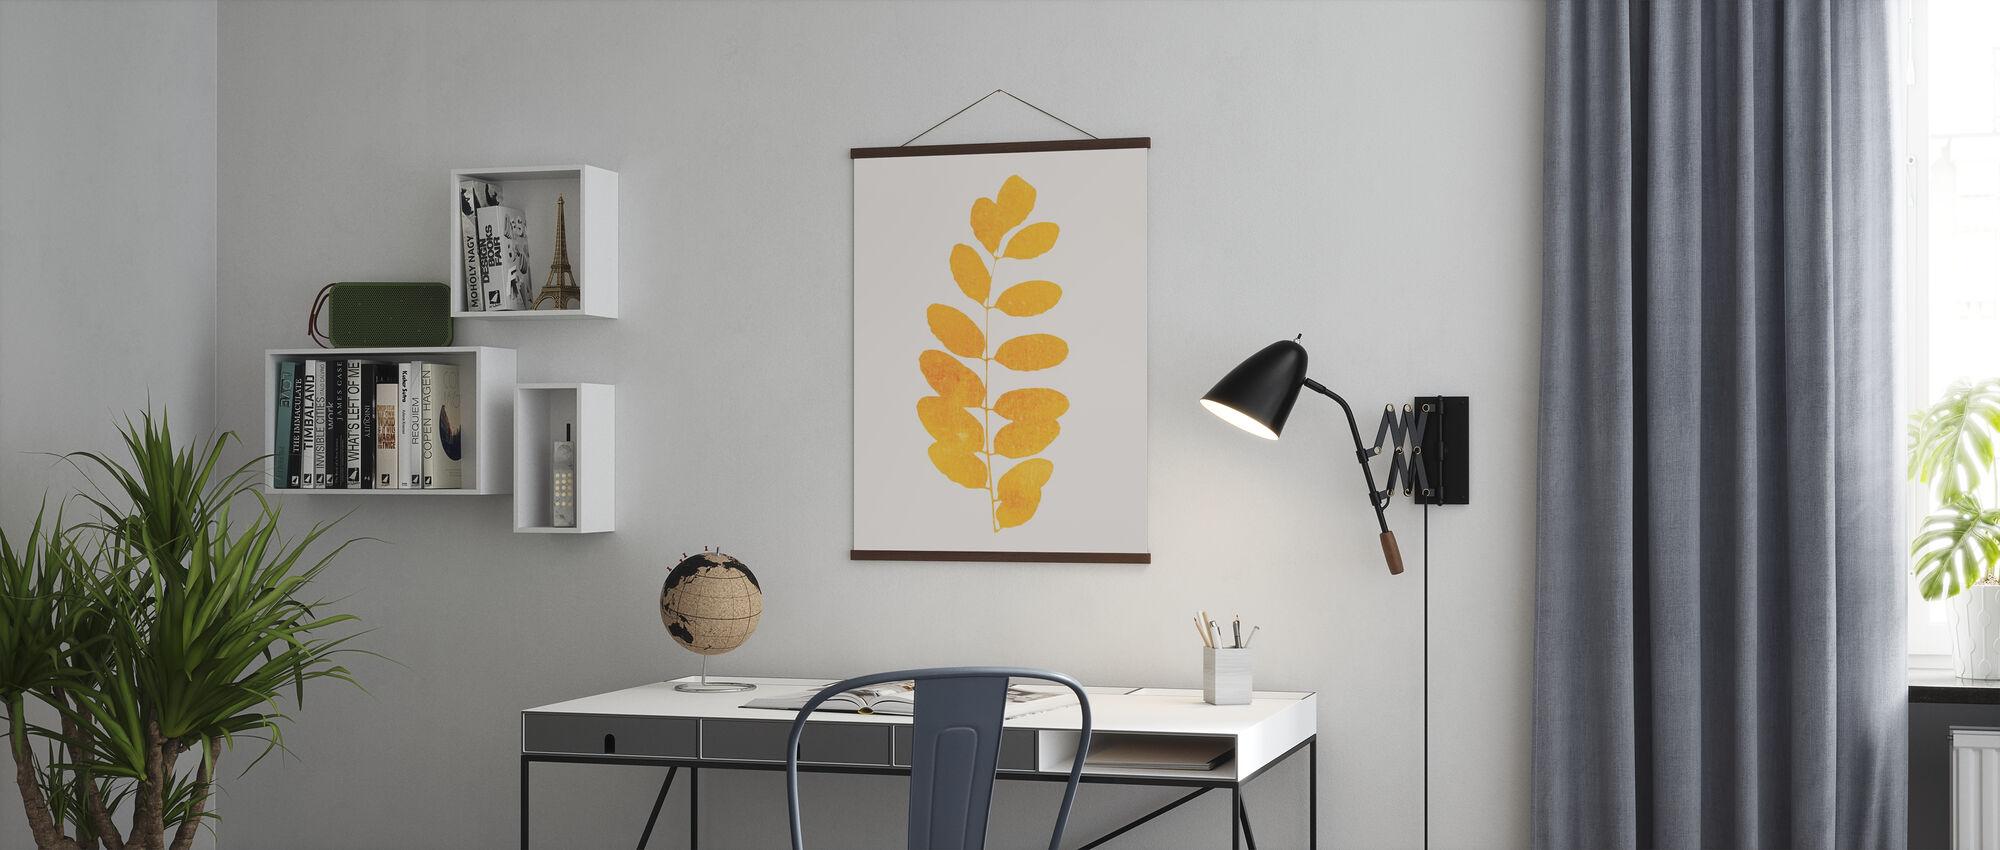 Leaf - Amarillo - Poster - Office